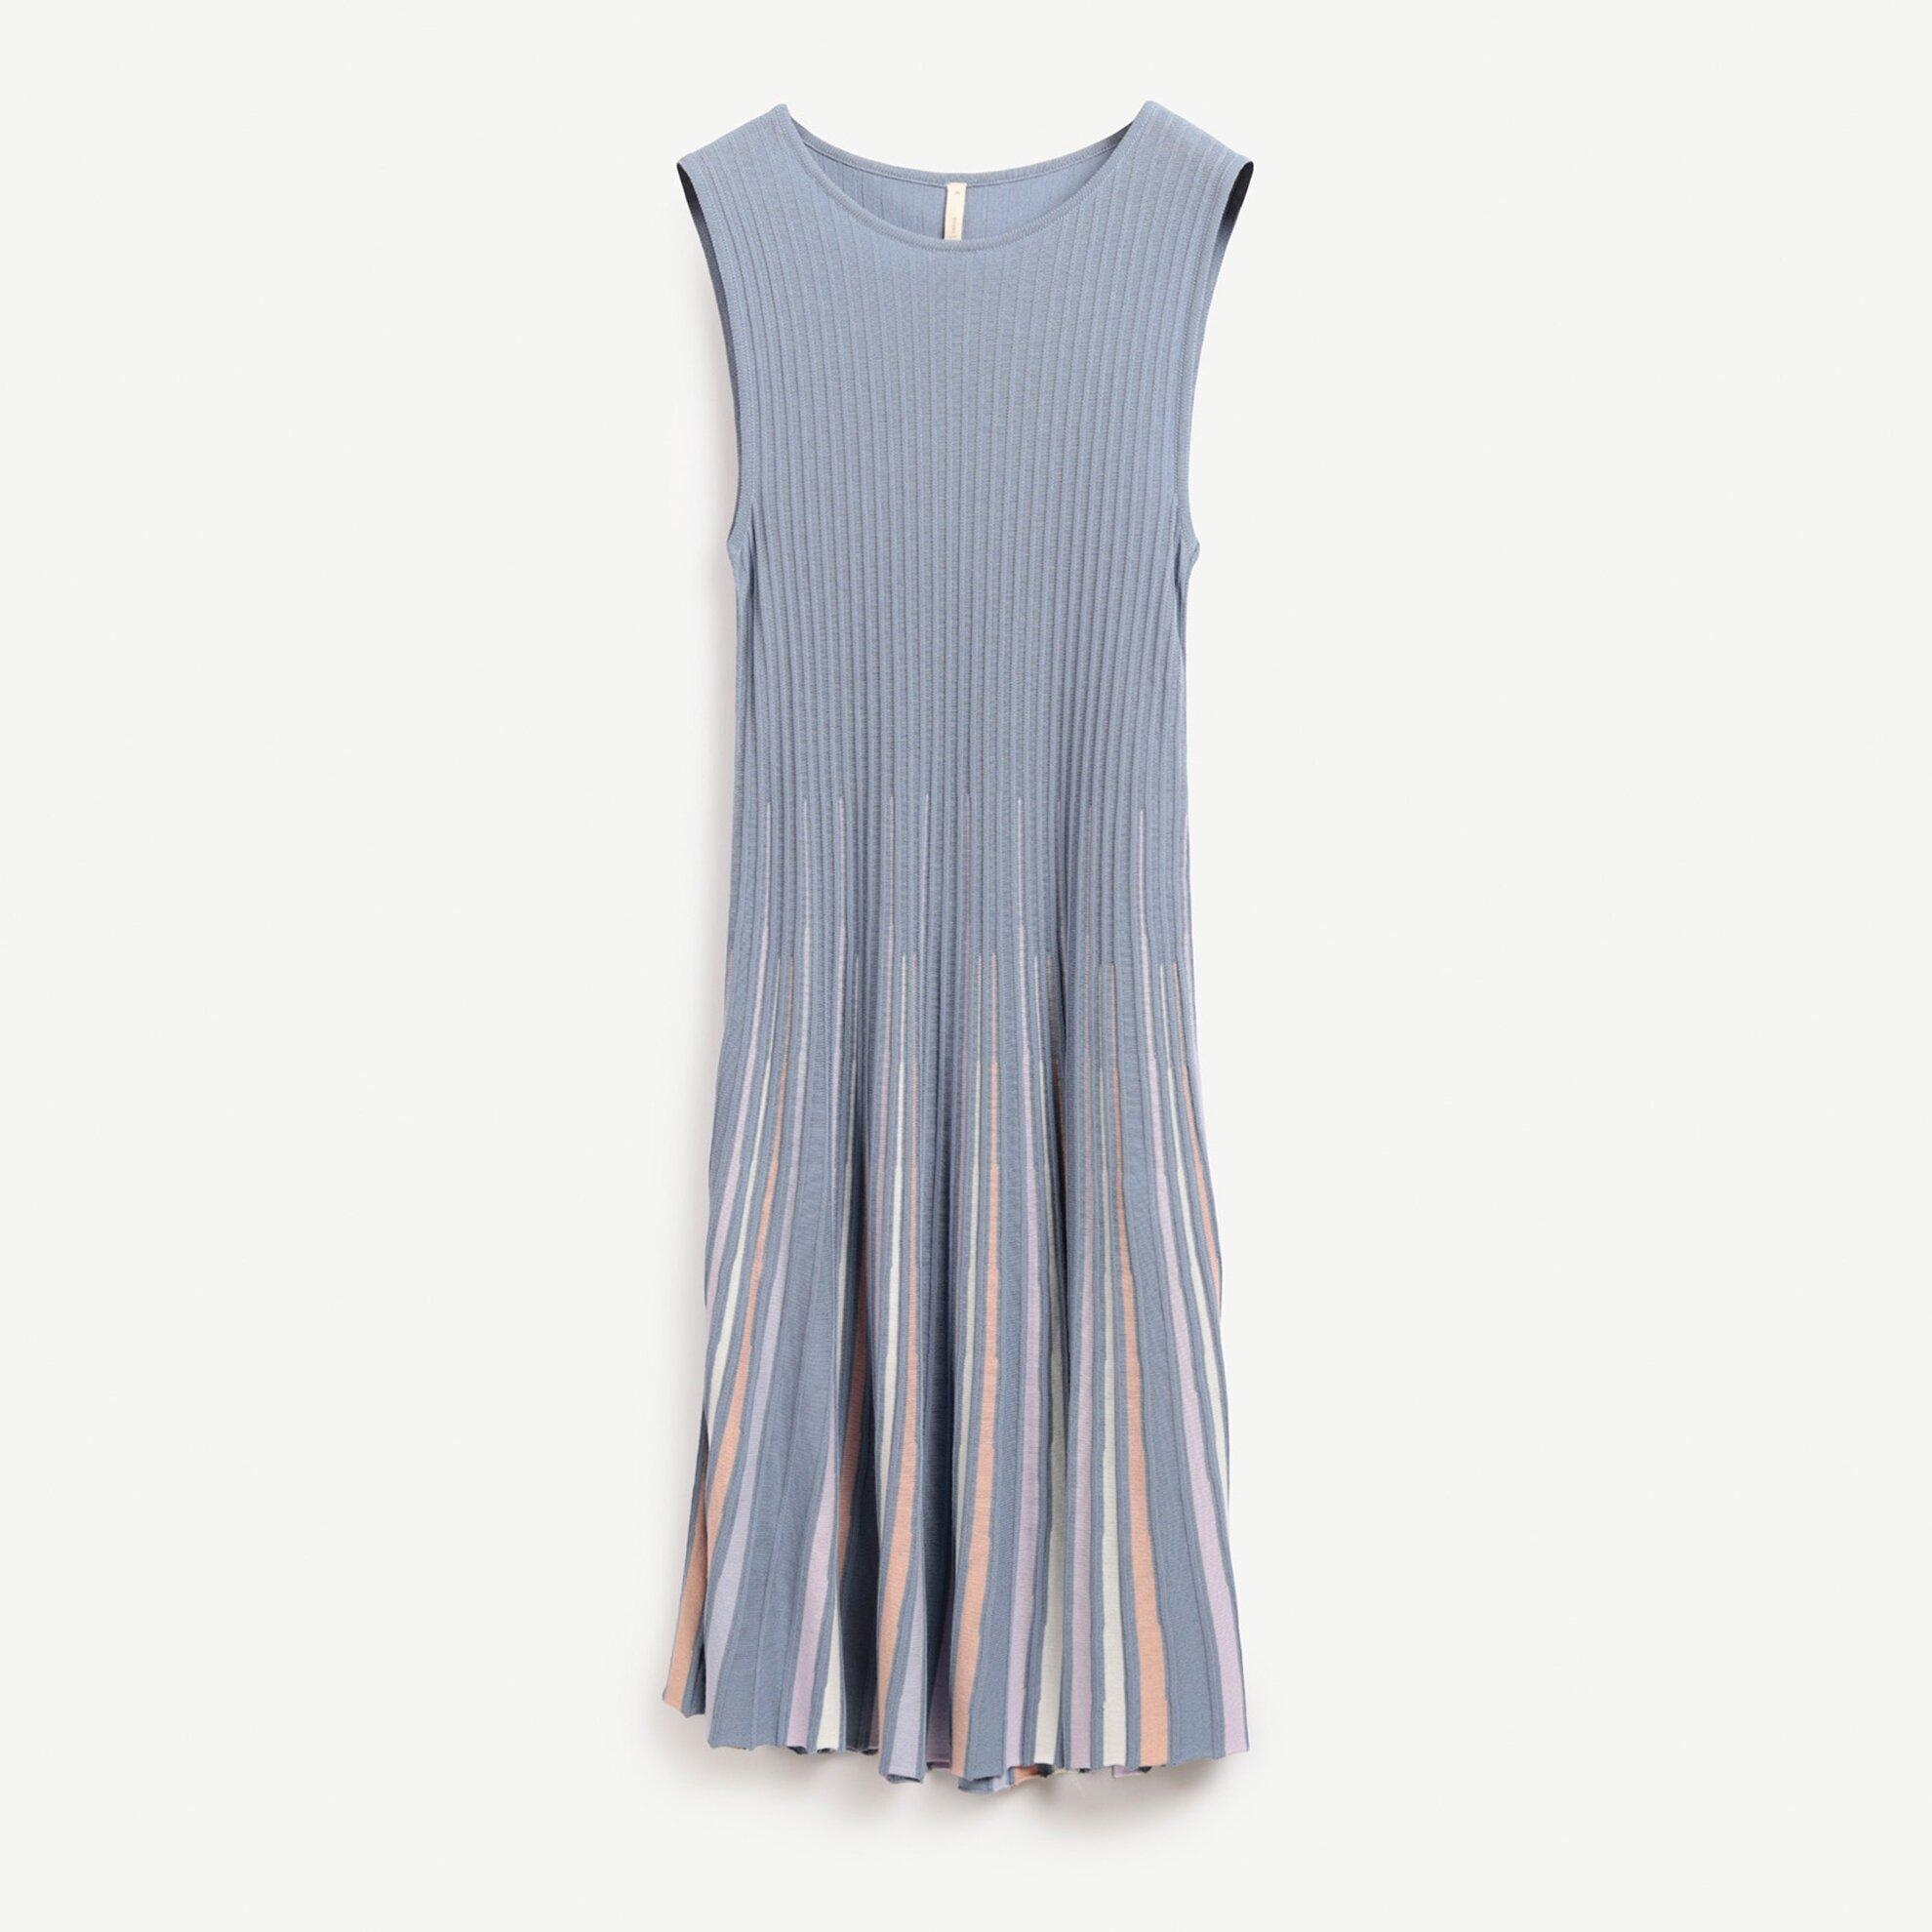 Plise Detaylı Uzun Triko Elbise